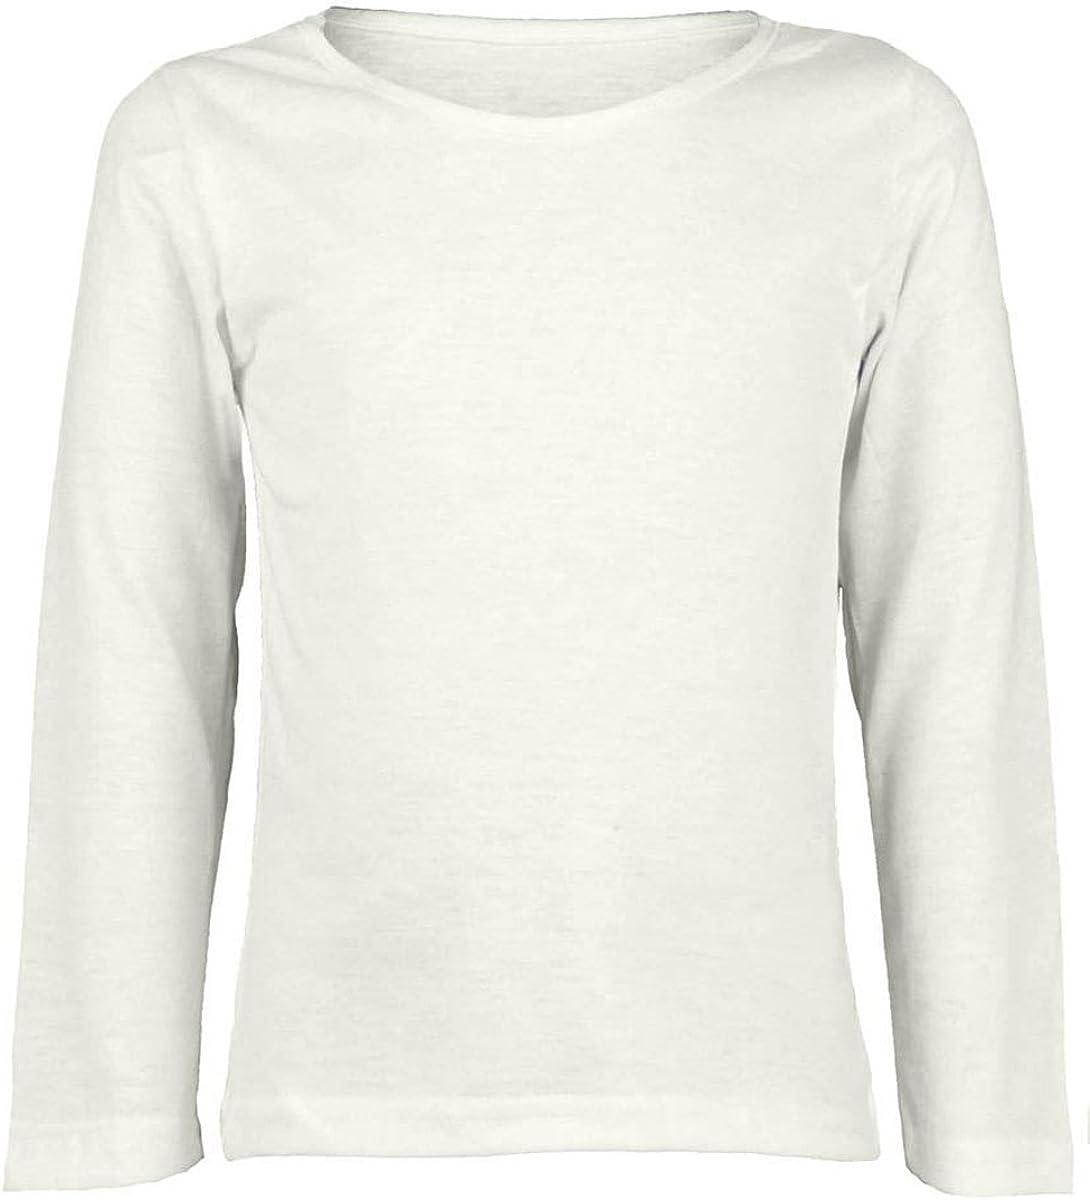 Kids Boys Girls Basic Crew Neck Classic Quality Plain Cotton Long Sleeve T-Shirt Tops Uniform Tee ref:3215